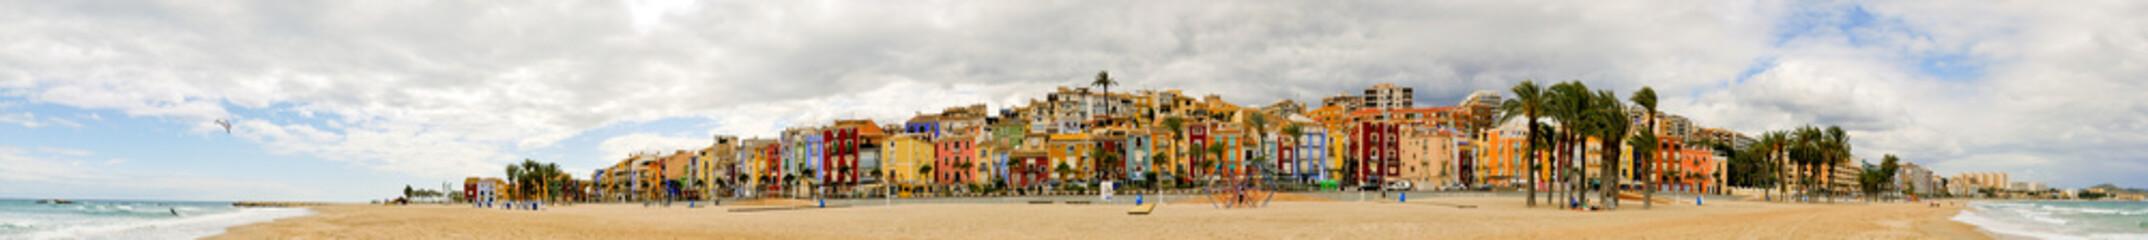 Fototapete - Panorama Spanien